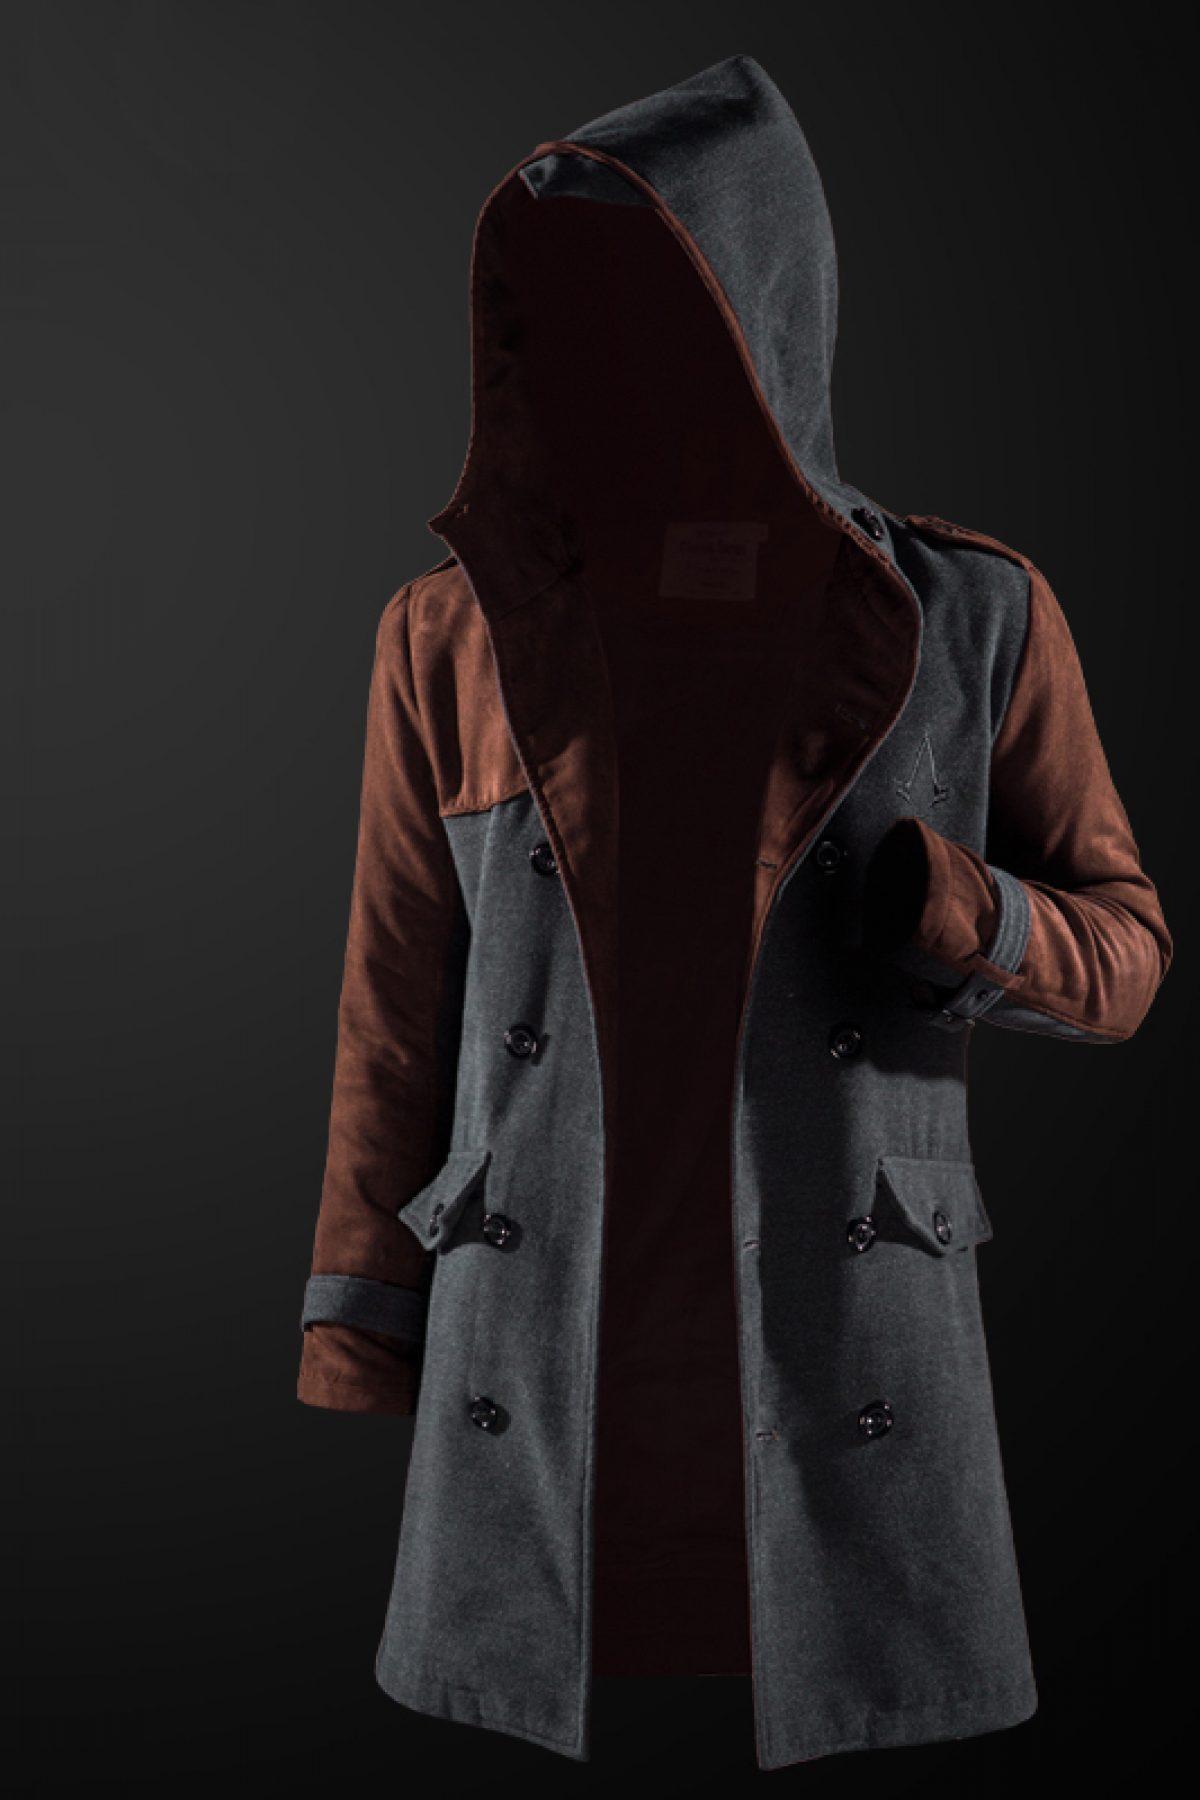 Assassins Creed Coat Hooded Jacket Cloth Robe Idolstore